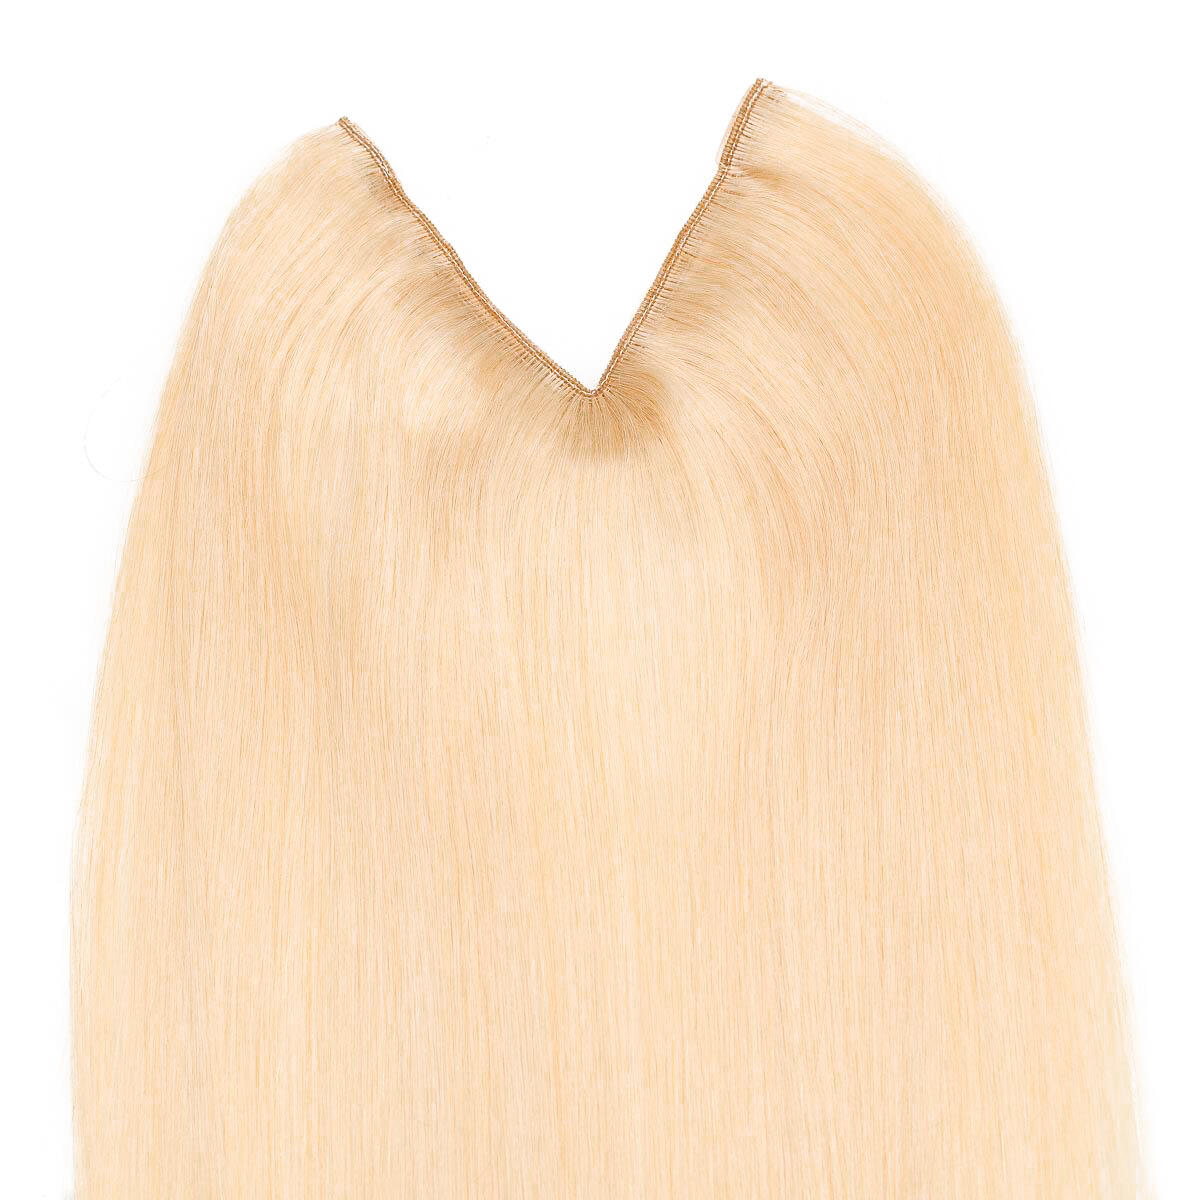 Easy Clip-in 8.3 Honey Blonde 50 cm